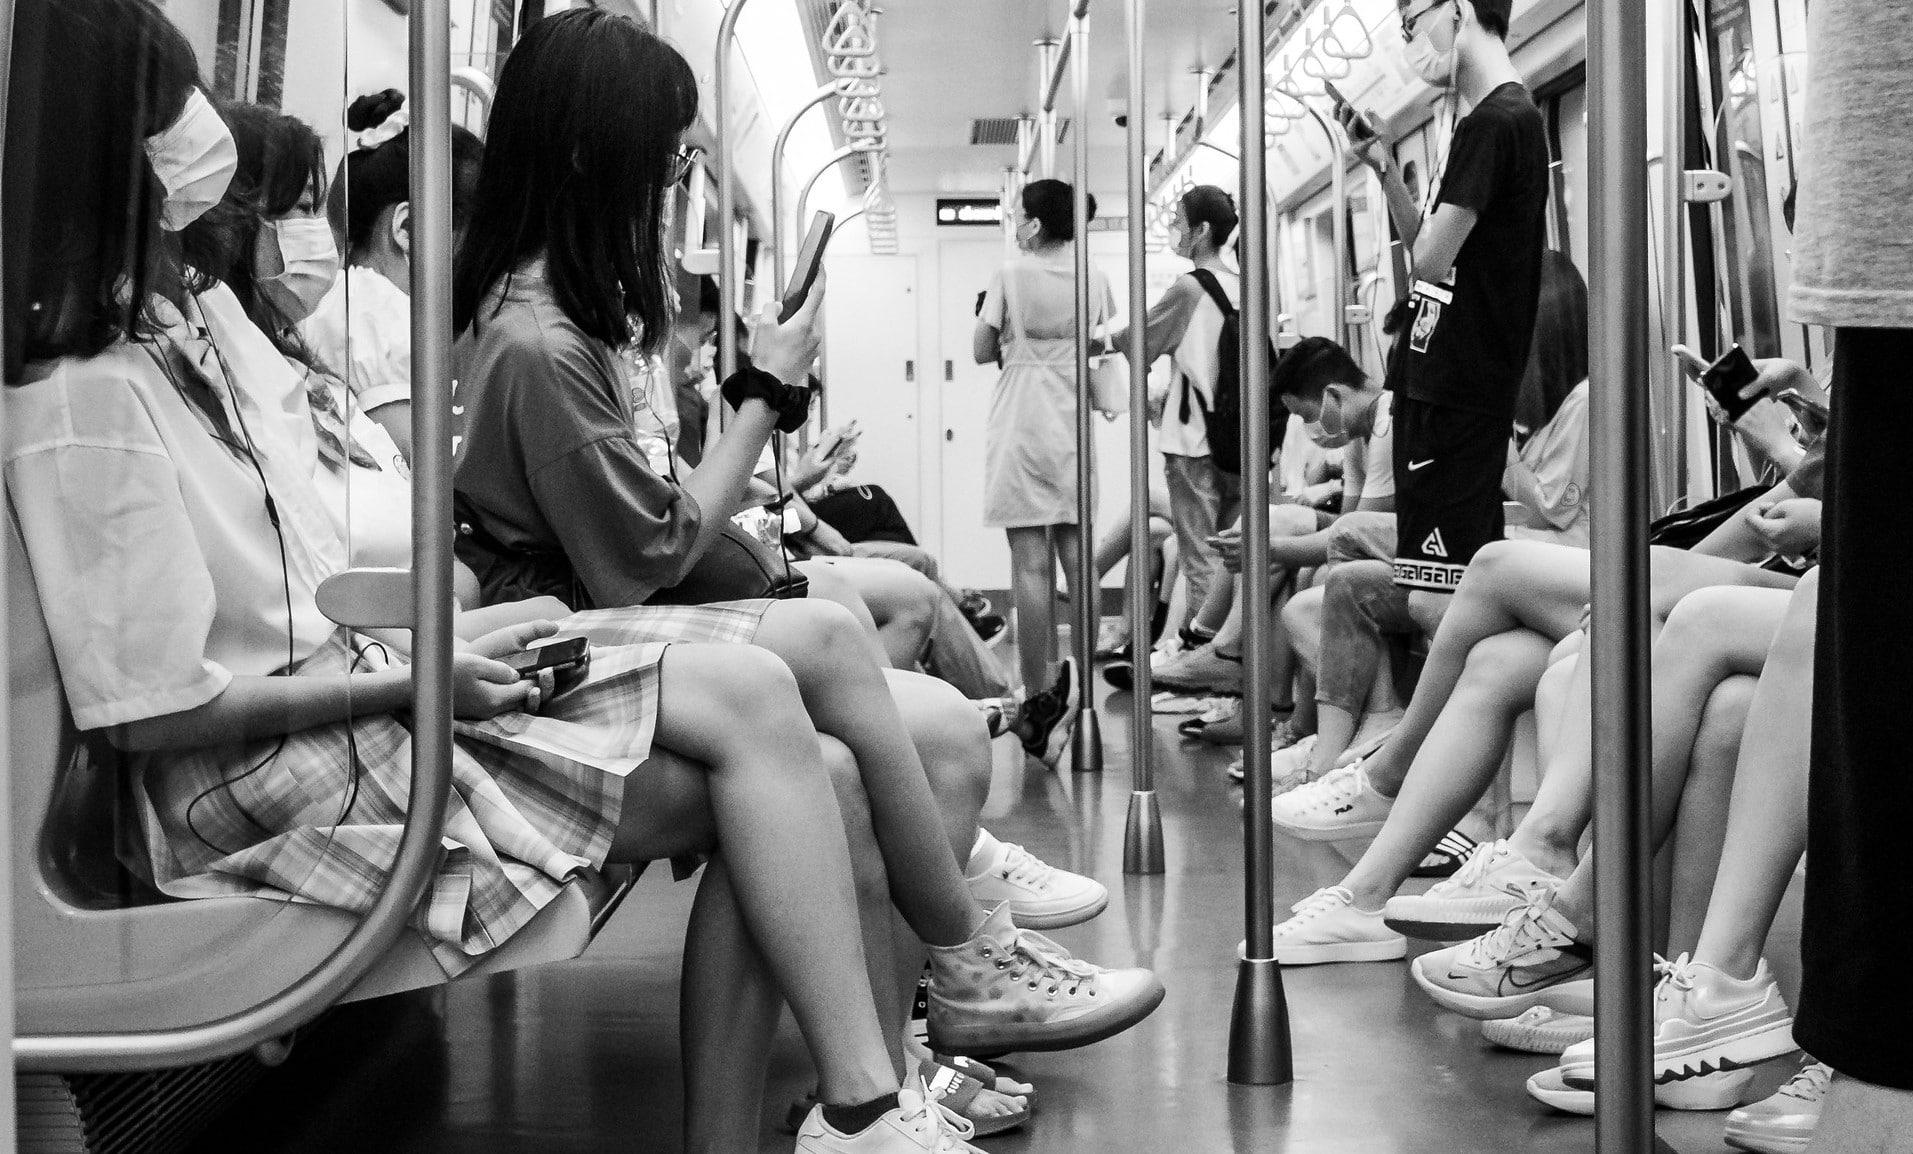 Qingdao Metro, China ©Gauthier Delecroix